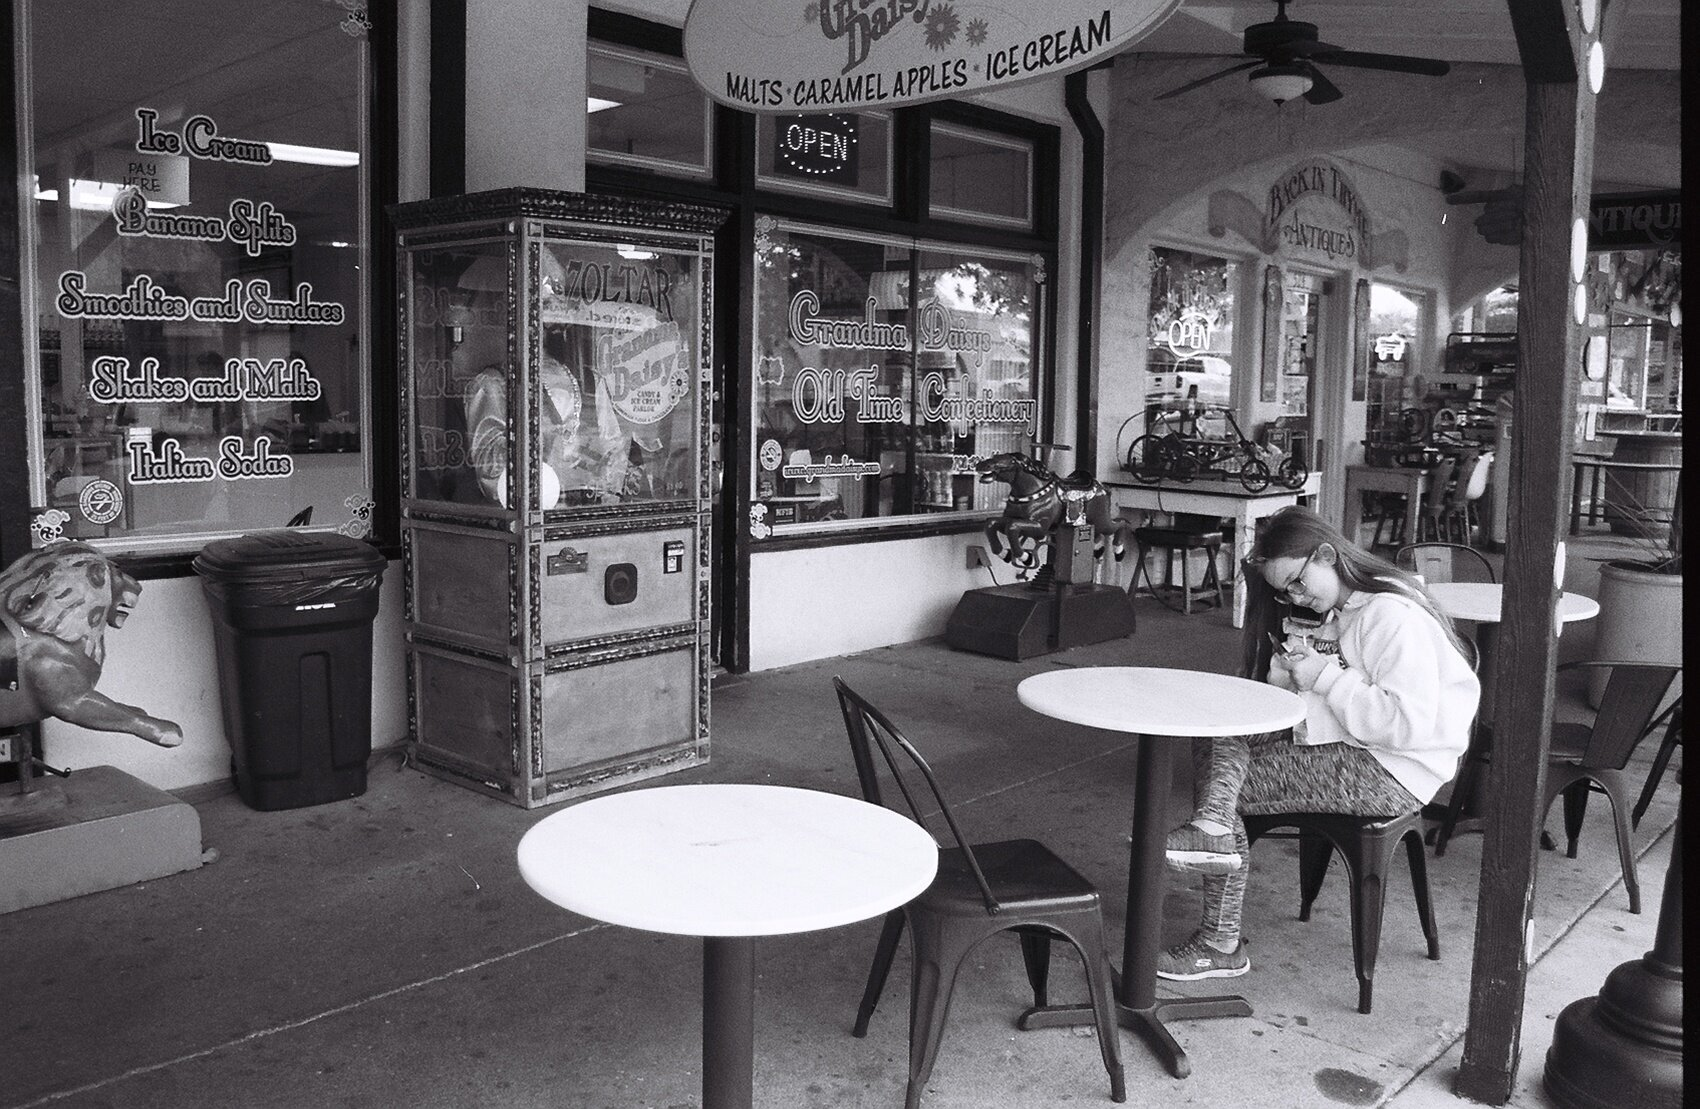 Grandma's Old Fashioned Ice Cream Parlor, Boulder City 2019